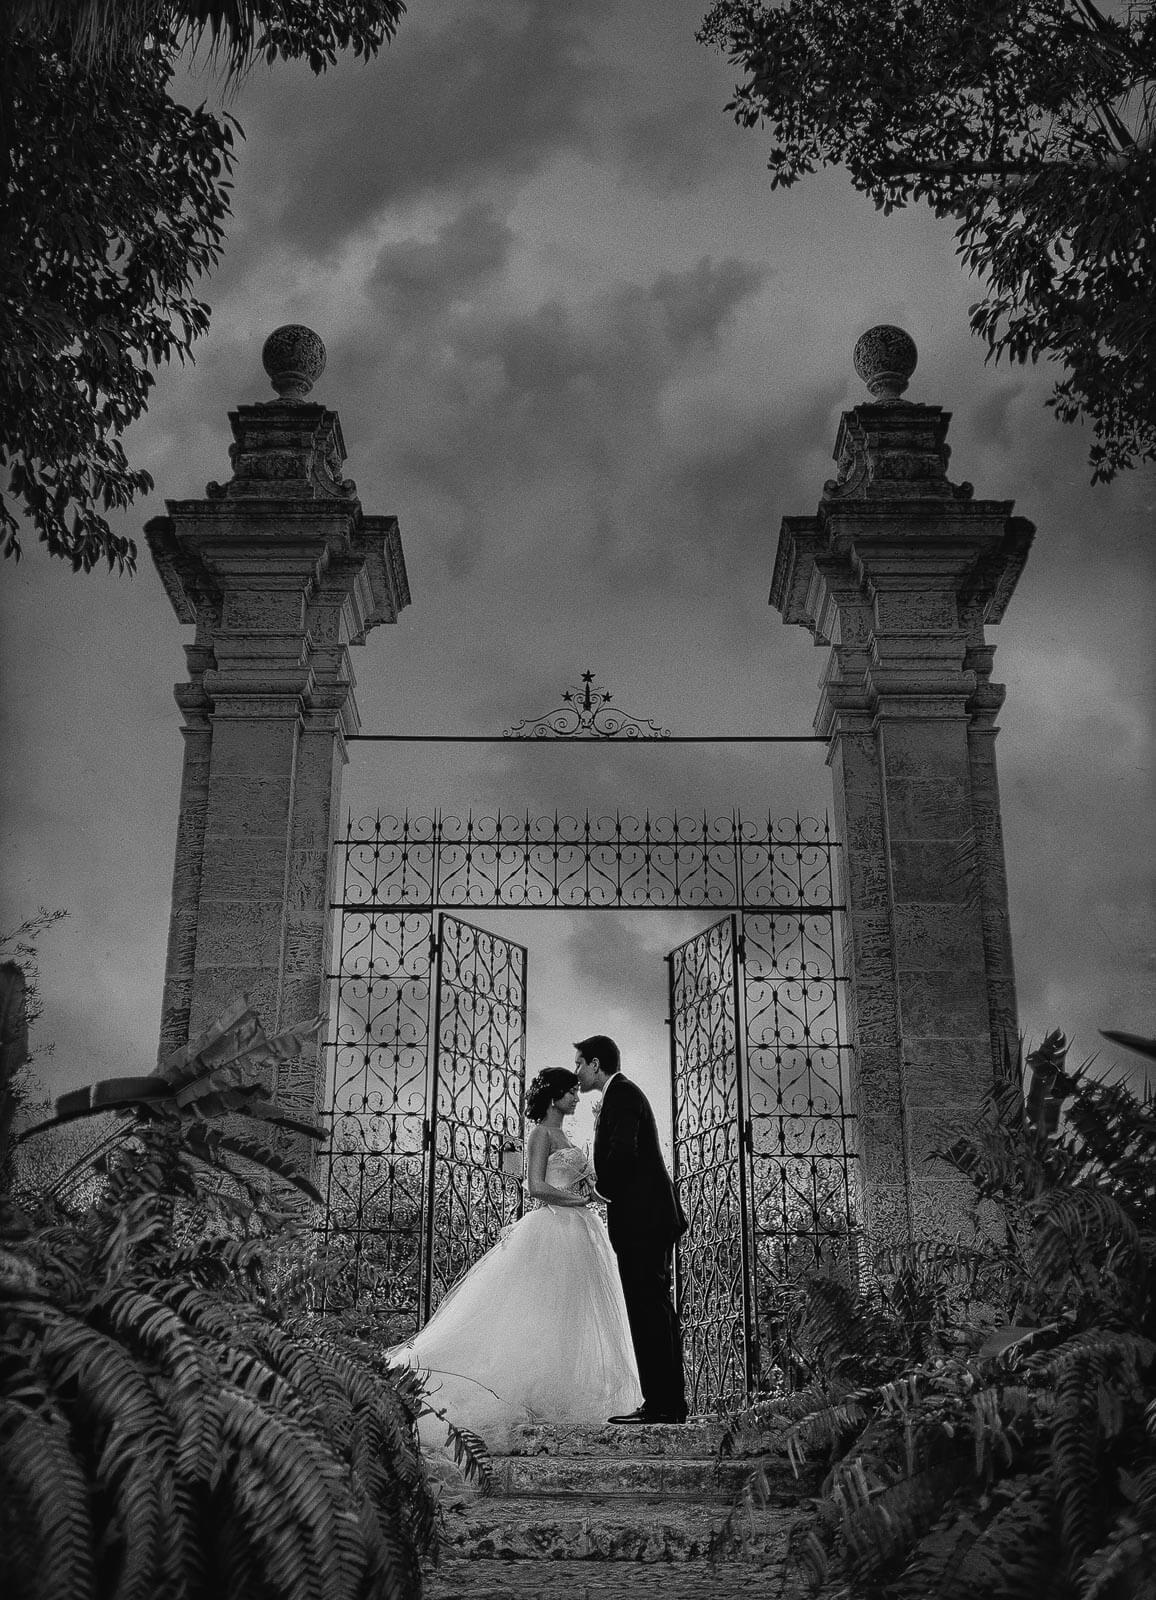 Couple at ornate gate entrance to Vizcaya - photo by Maloman Studios